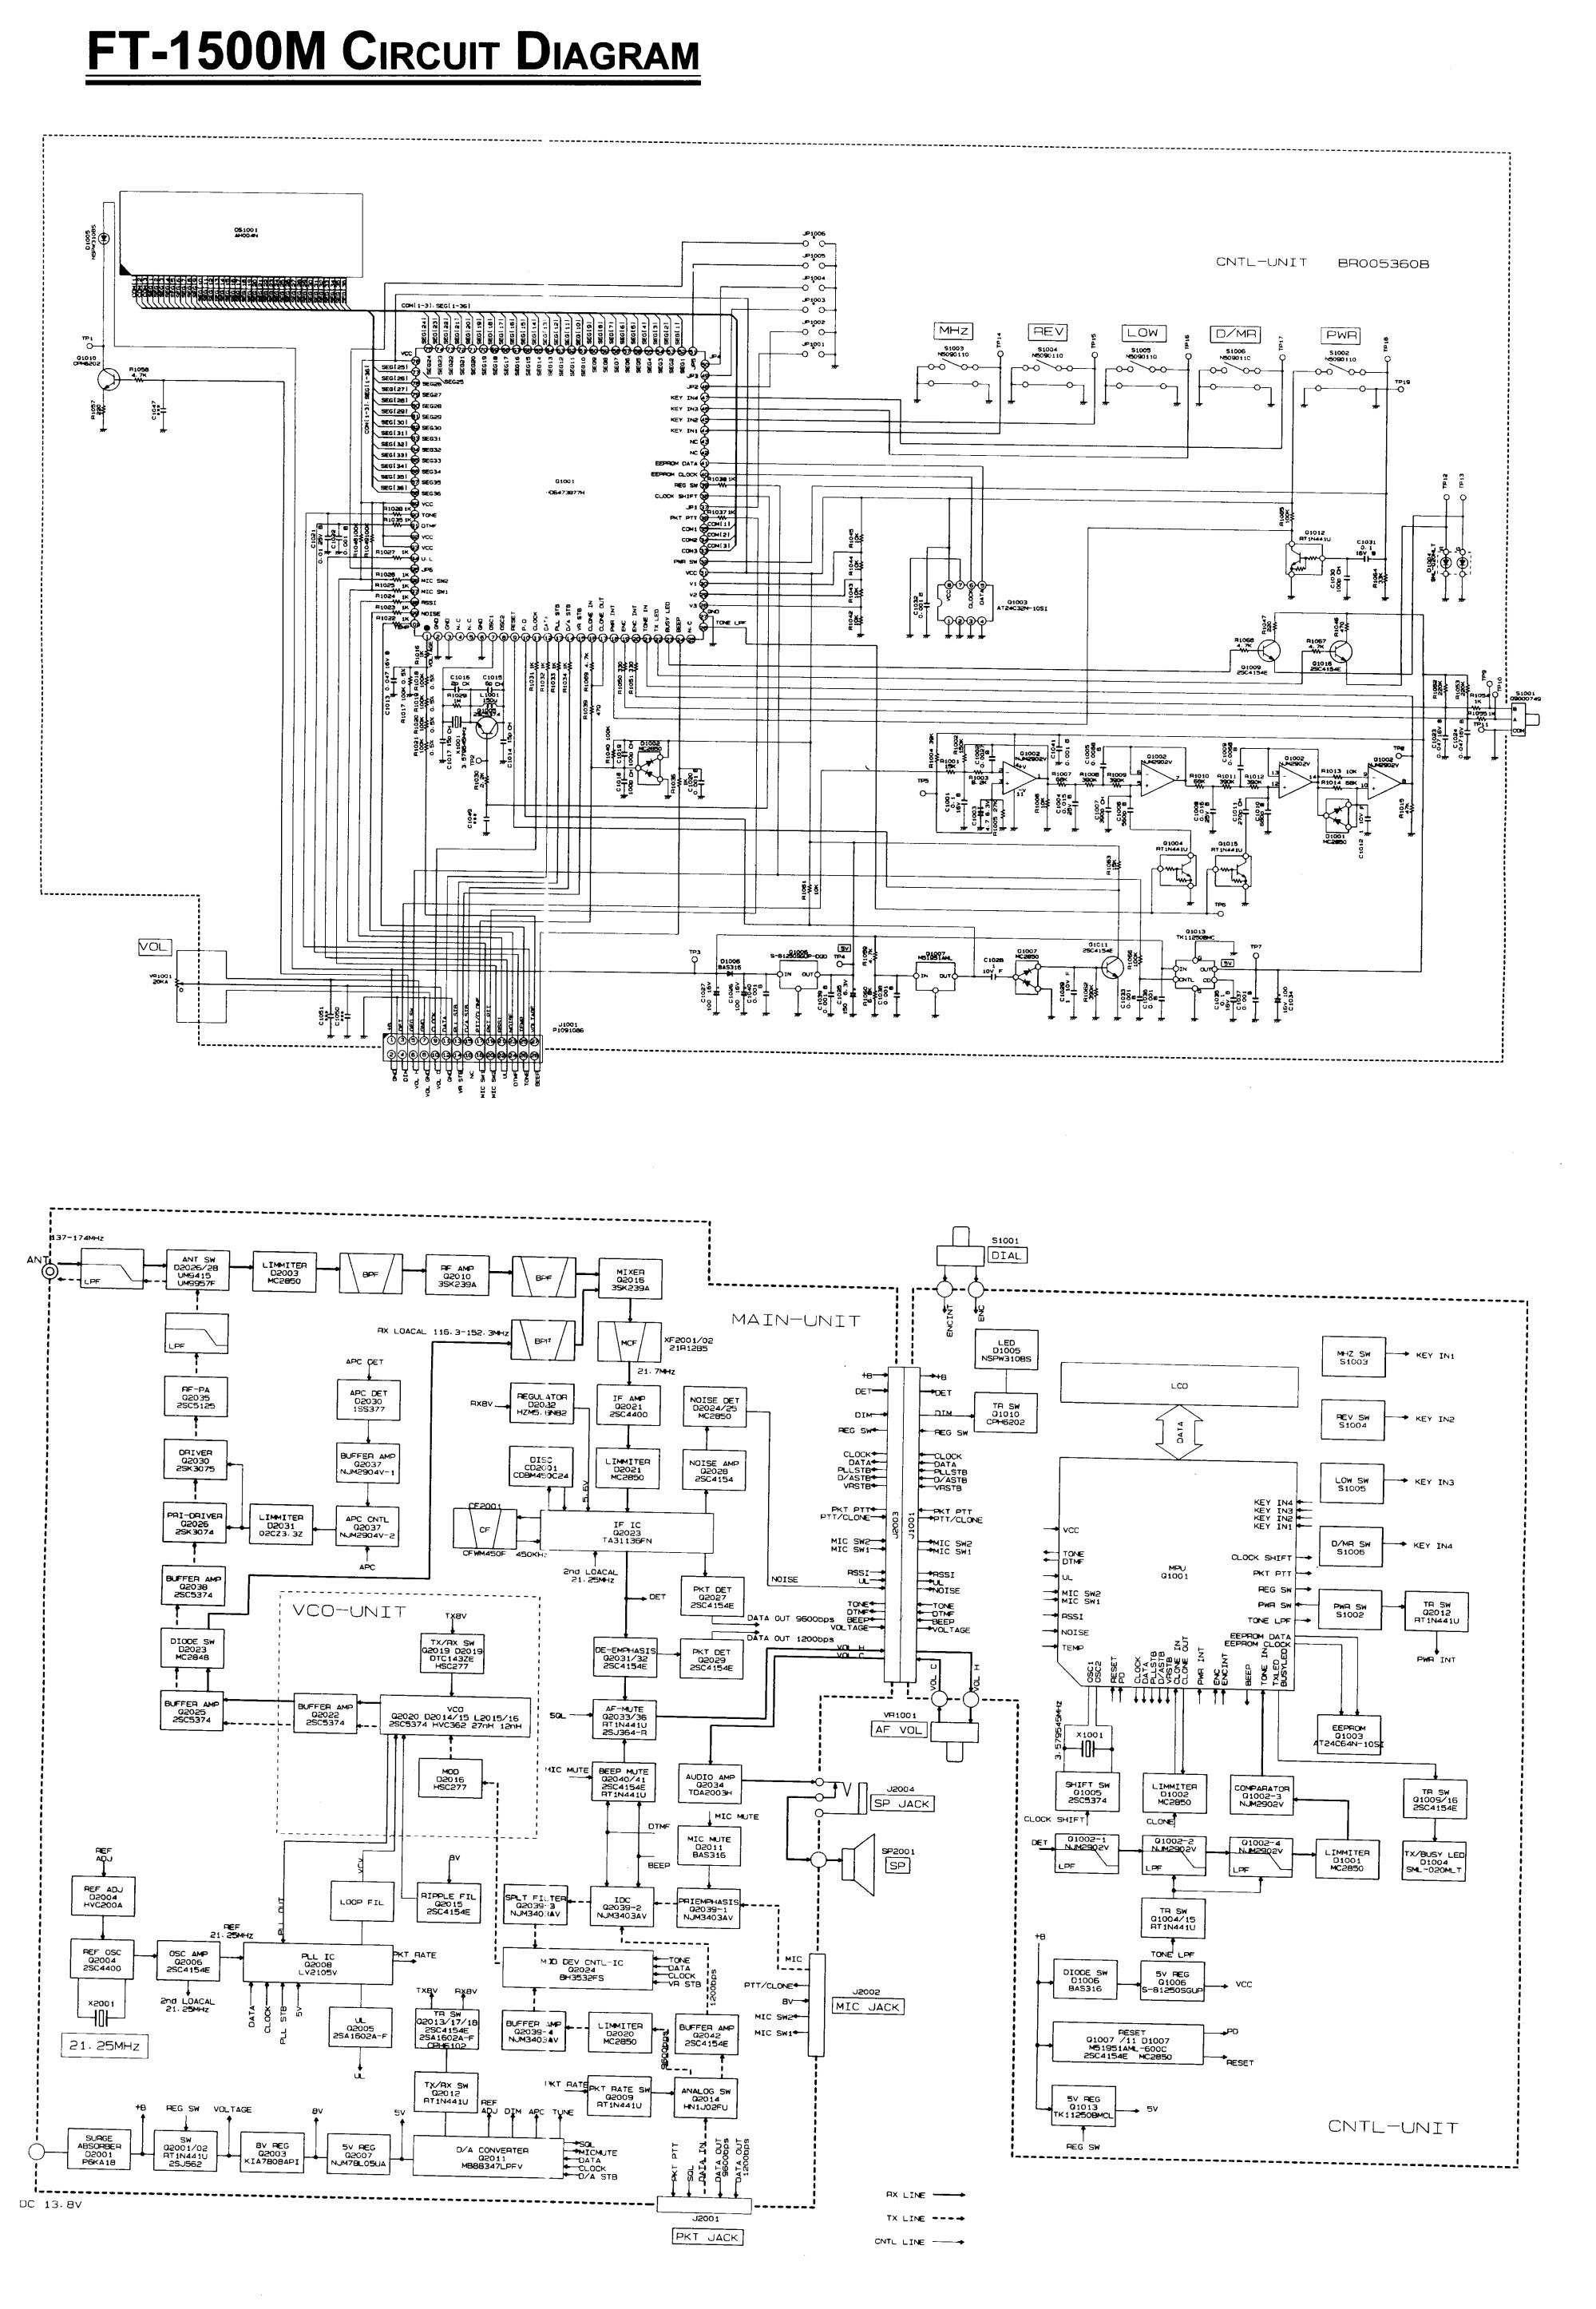 hight resolution of yaesu ft 1500 schematics jpg 3 699 mb download